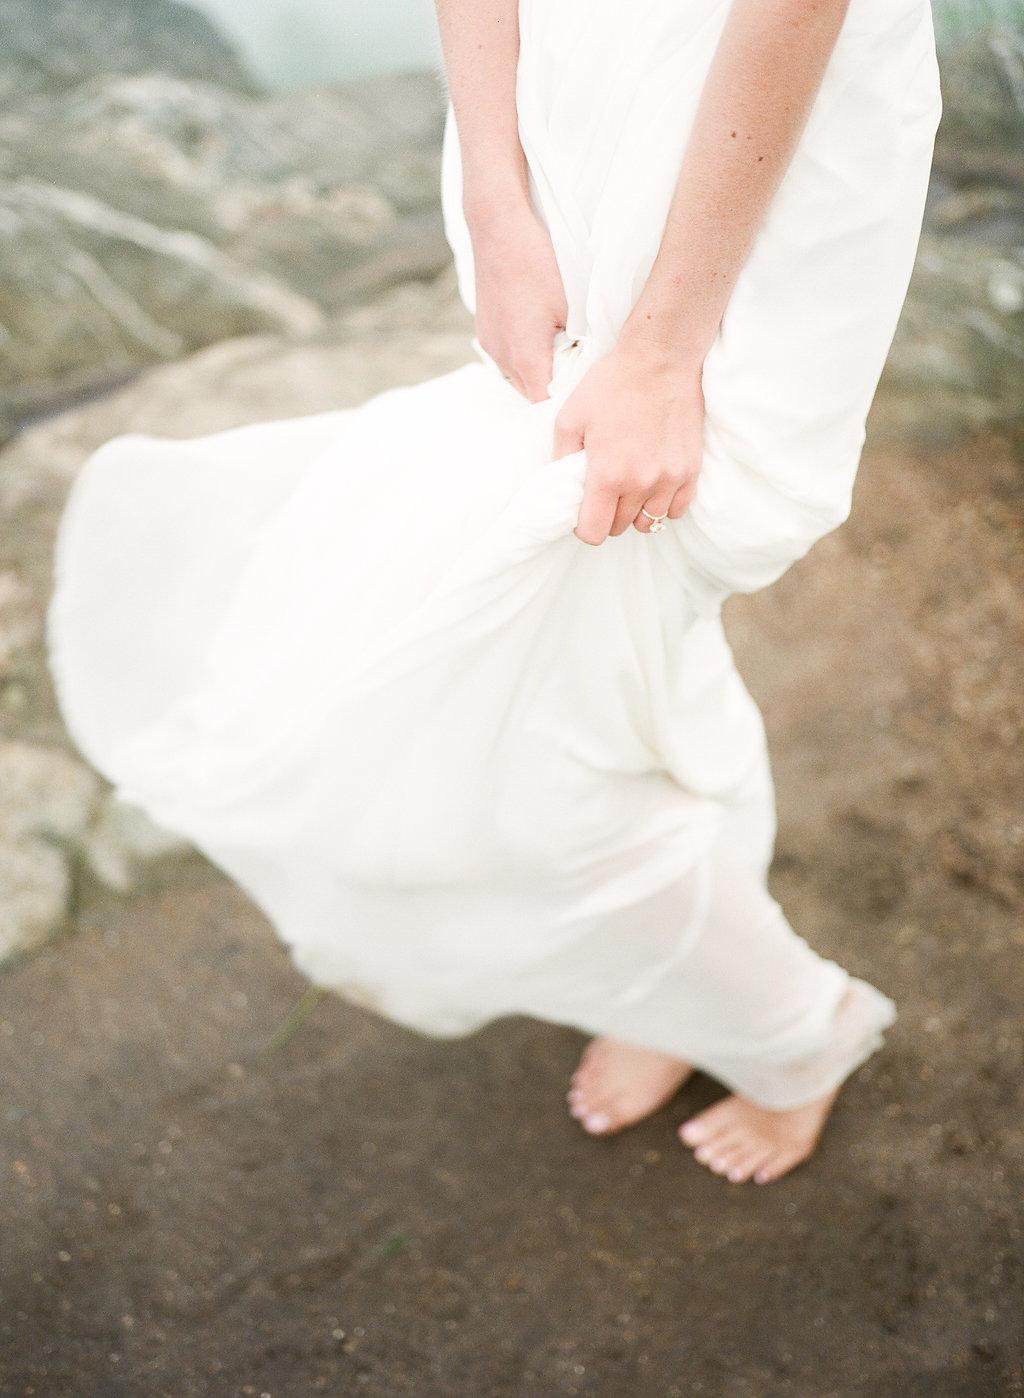 josie-photographs-urban-petals-mountain-wedding-north-carolina-mountain-wedding-ivory-and-beau-bridal-boutique-savannah-wedding-dresses-savannah-bridal-boutique-savannah-wedding-gowns-sarah-seven-lafayette-sarah-seven-wedding-dress-boho-bride-23.jpg